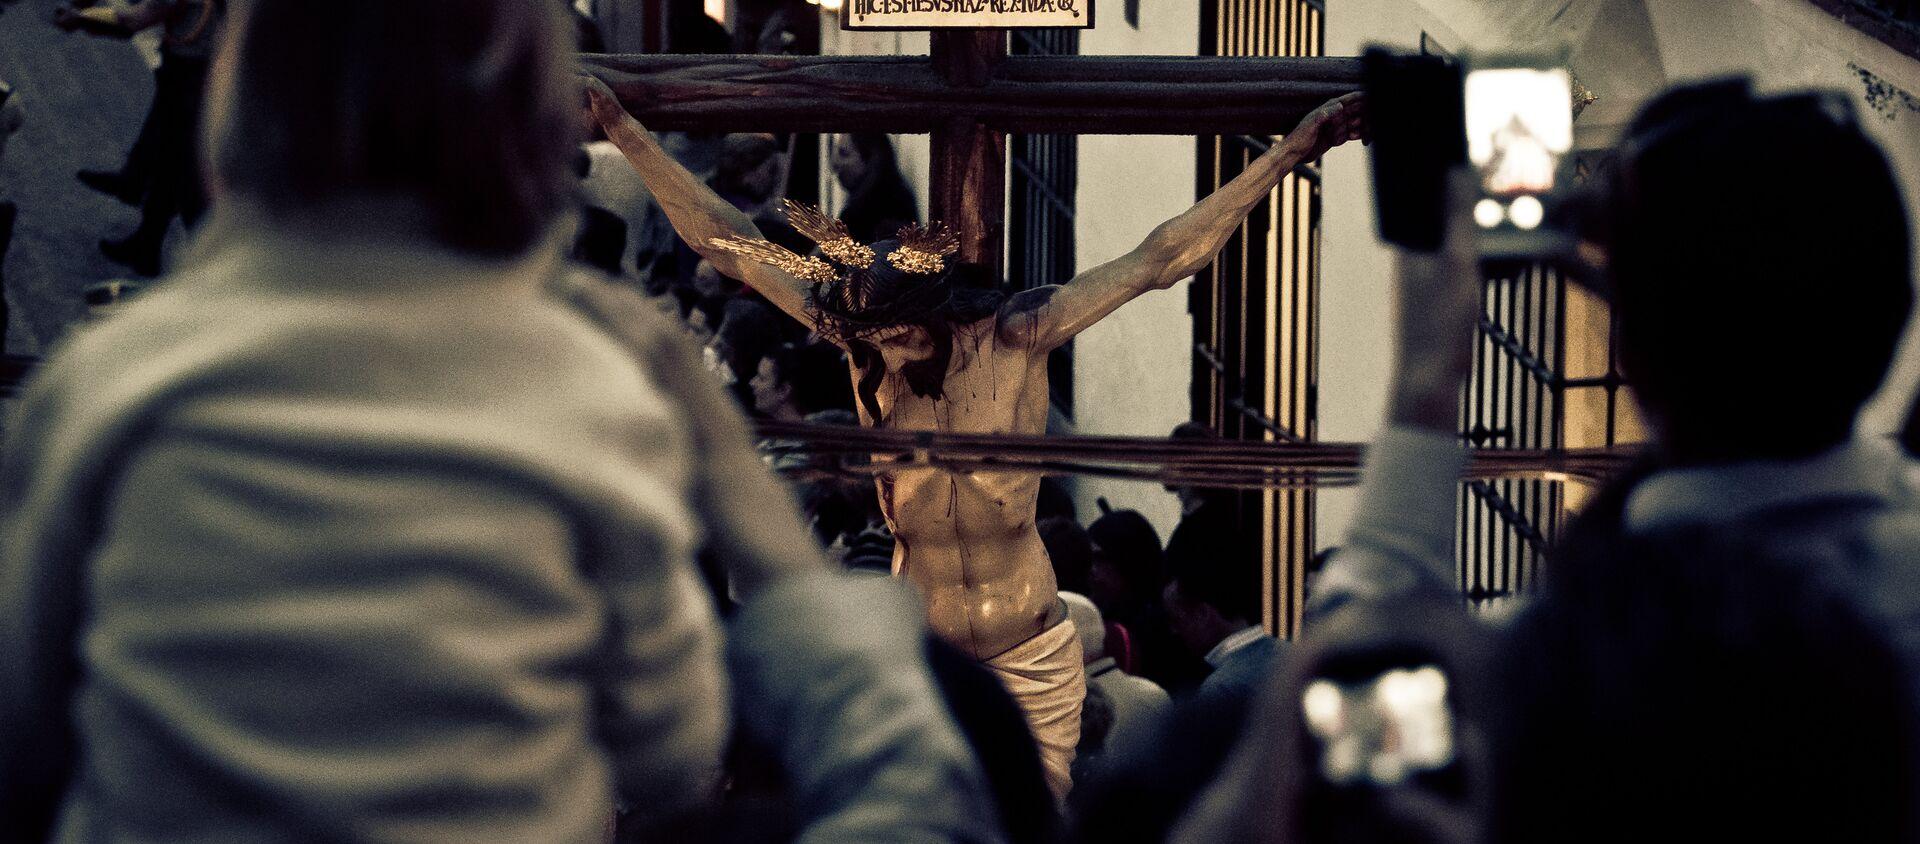 Crucifixión - Sputnik Mundo, 1920, 30.10.2020